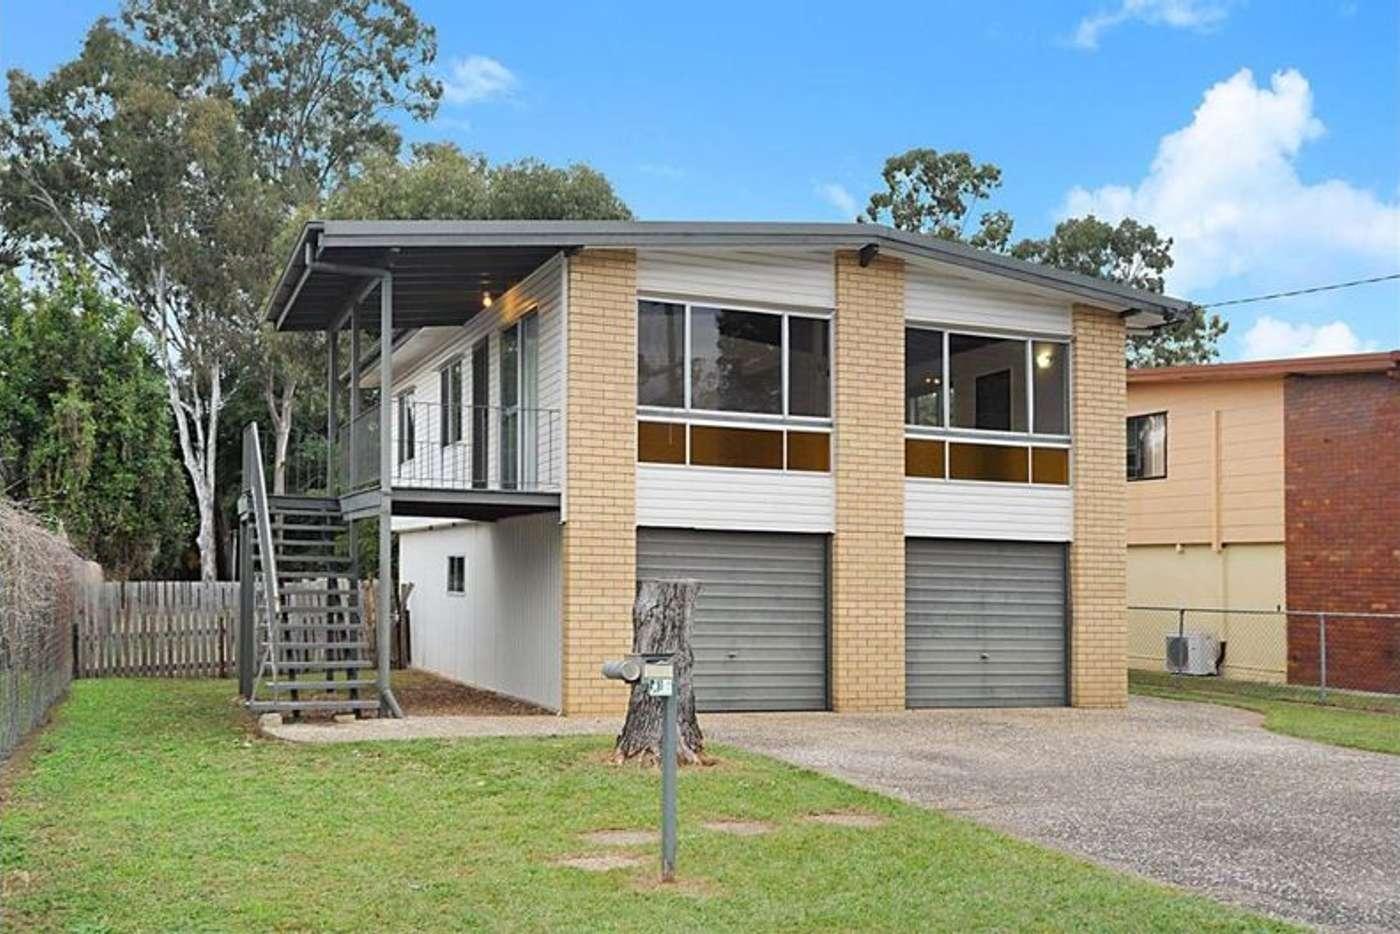 Main view of Homely house listing, 112 Spitfire Av, Strathpine QLD 4500